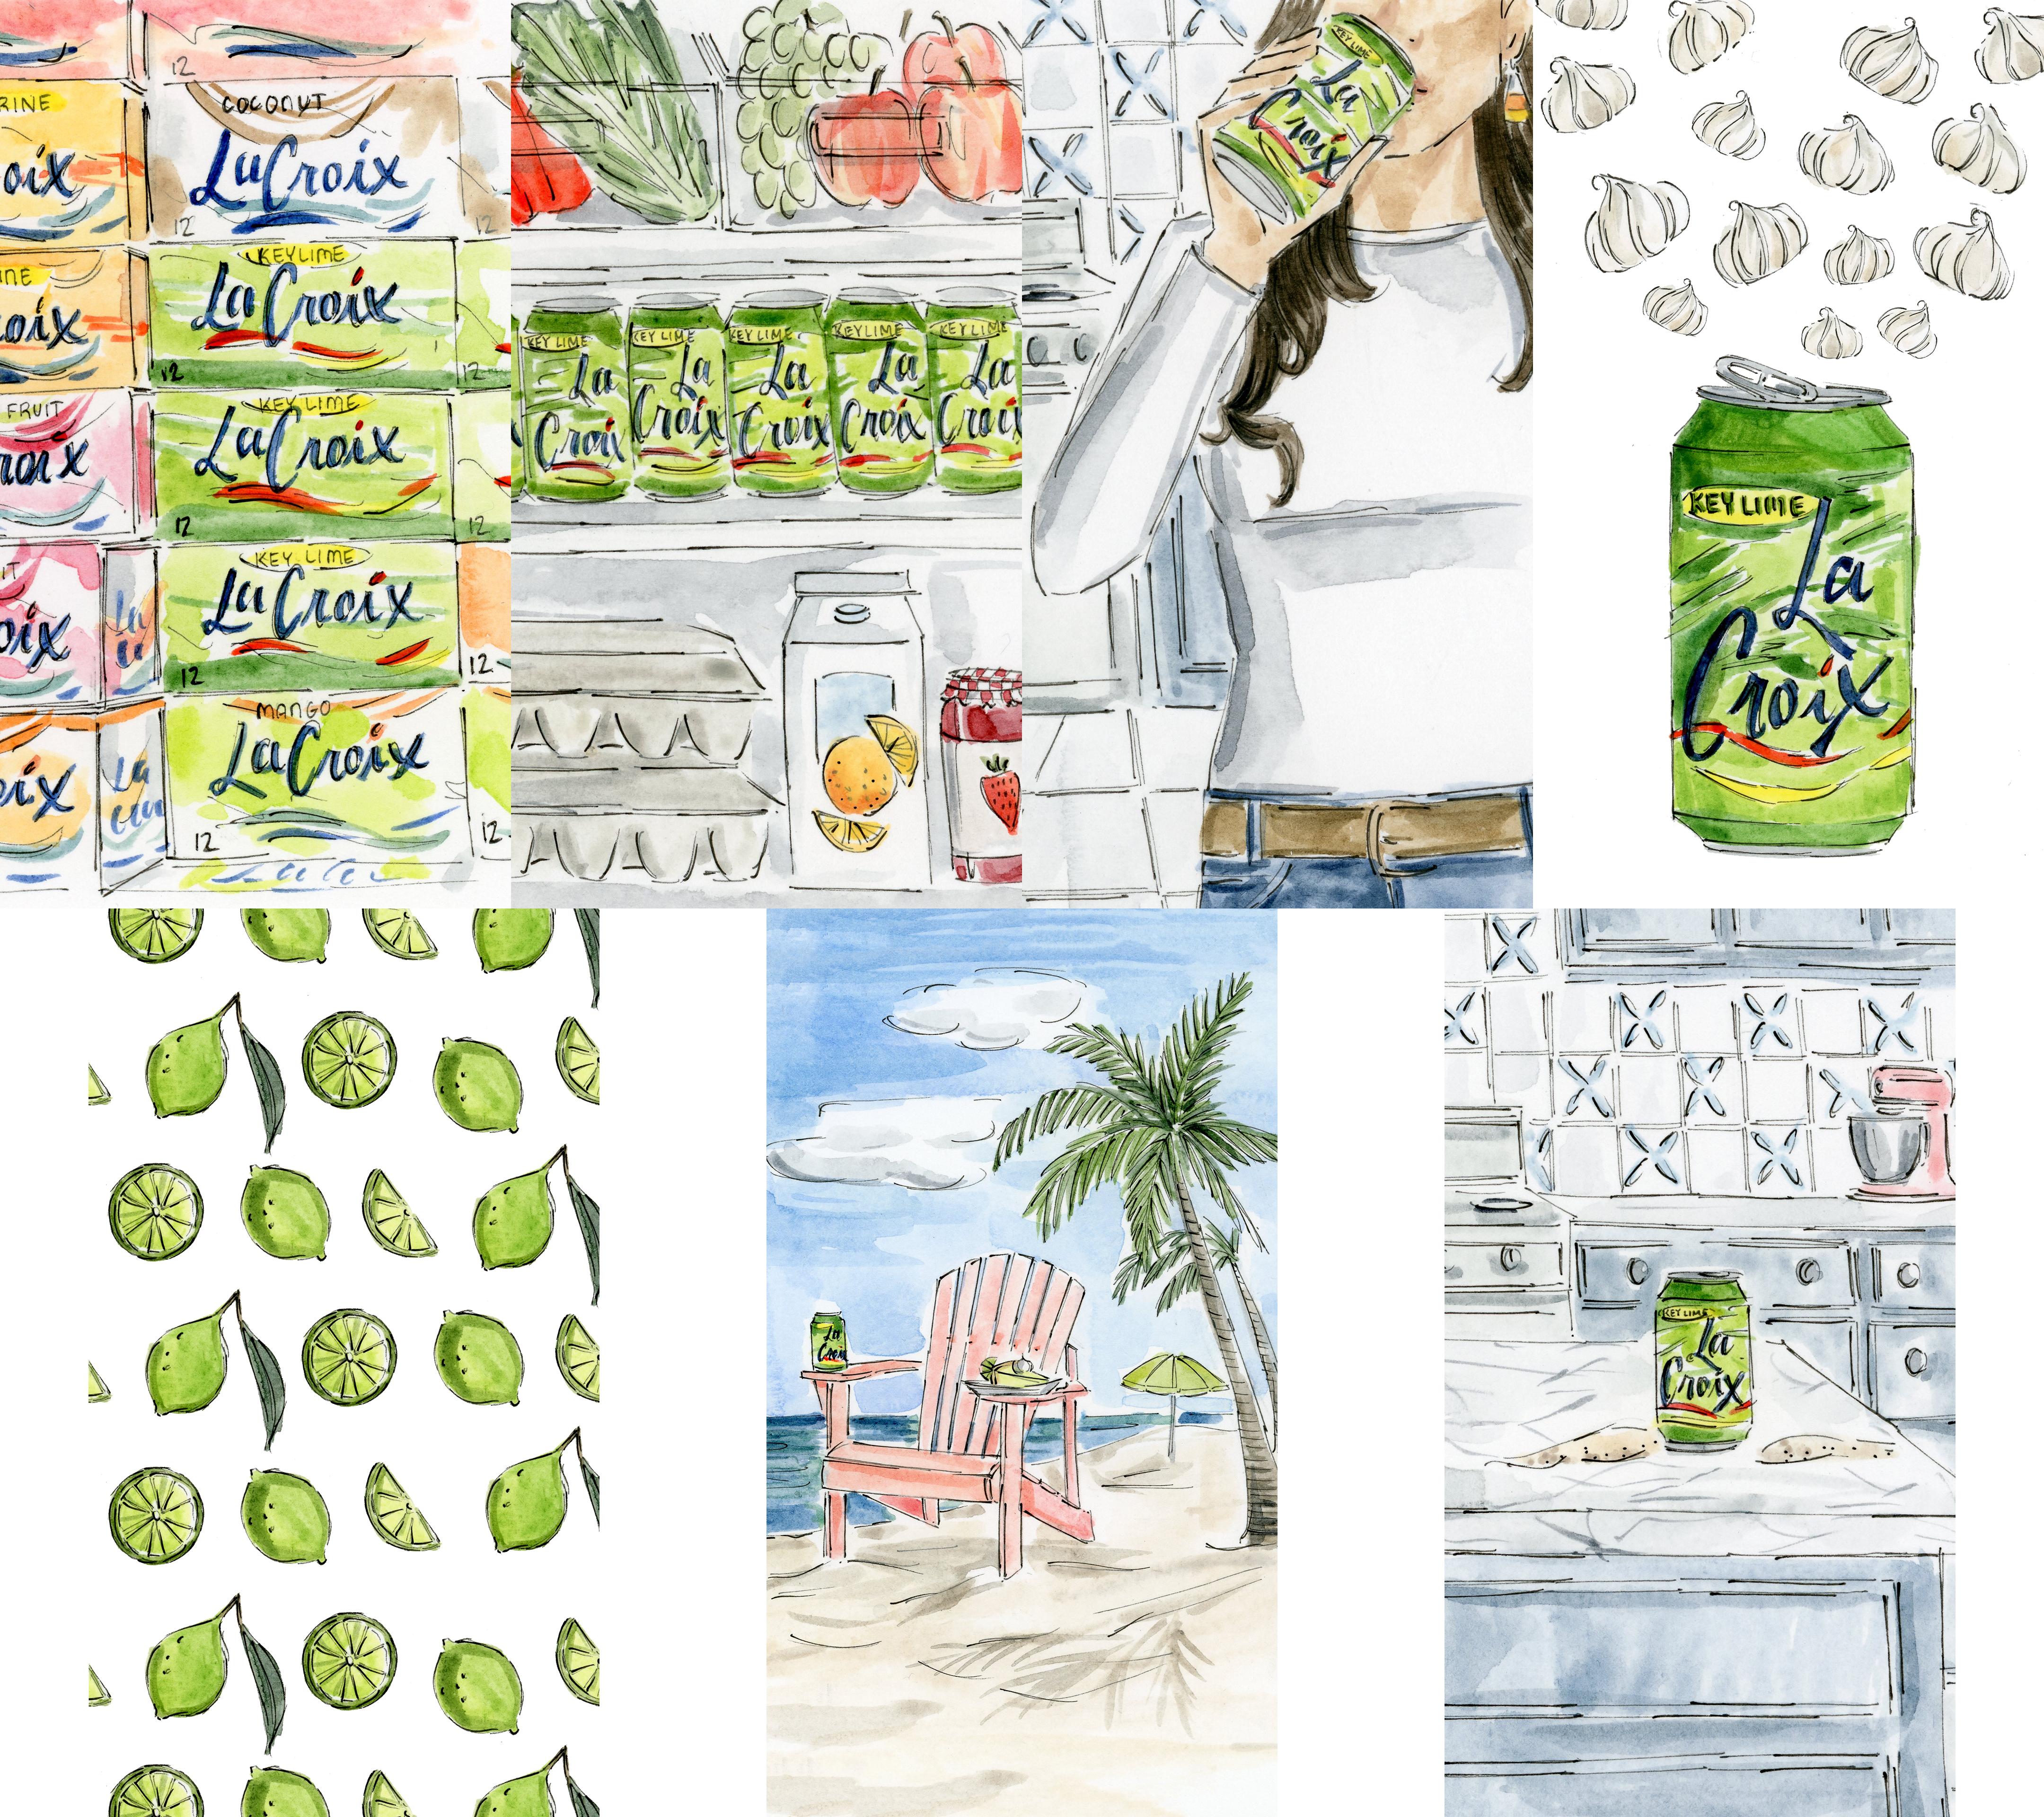 Illustrations for Instagram Stories